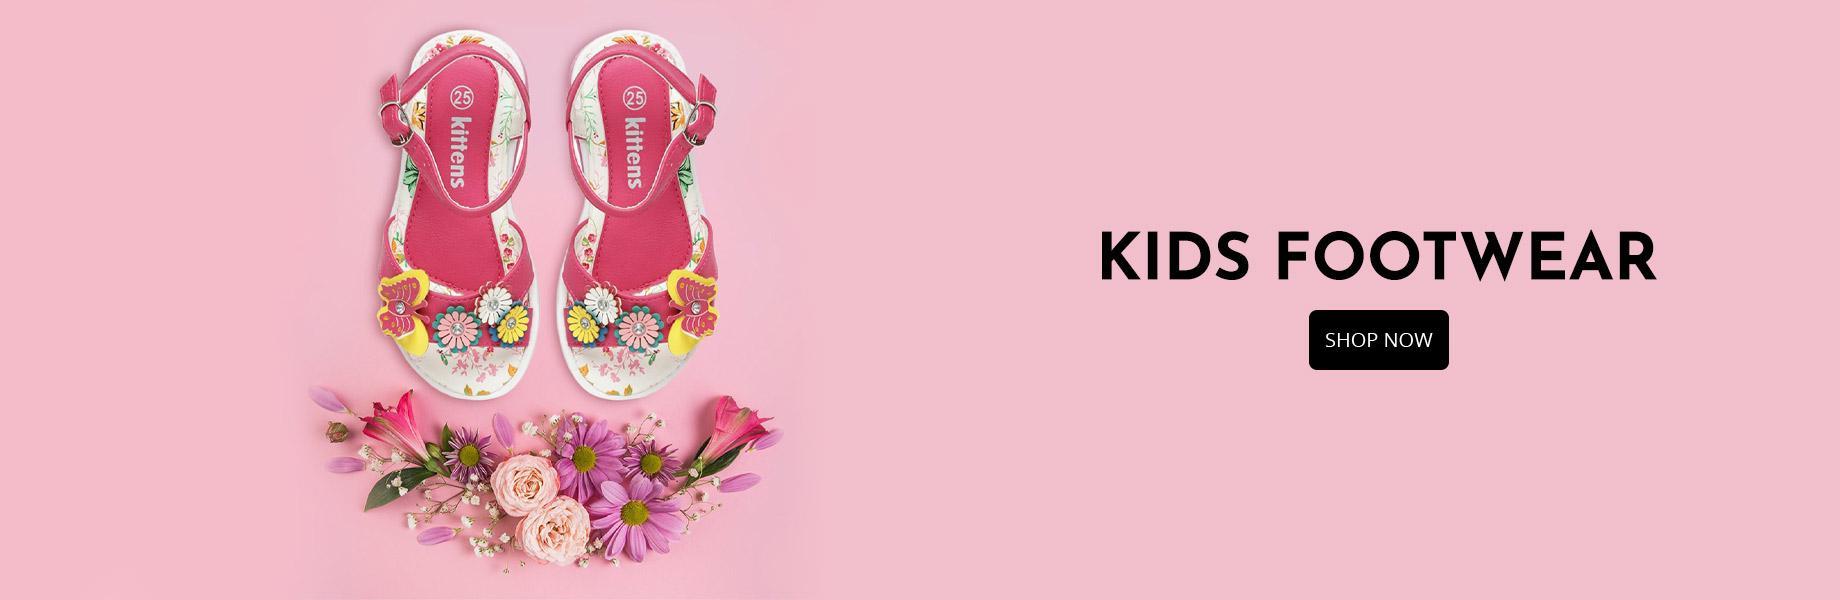 Monsoon-Footwear-Static-Kids-Web.jpg